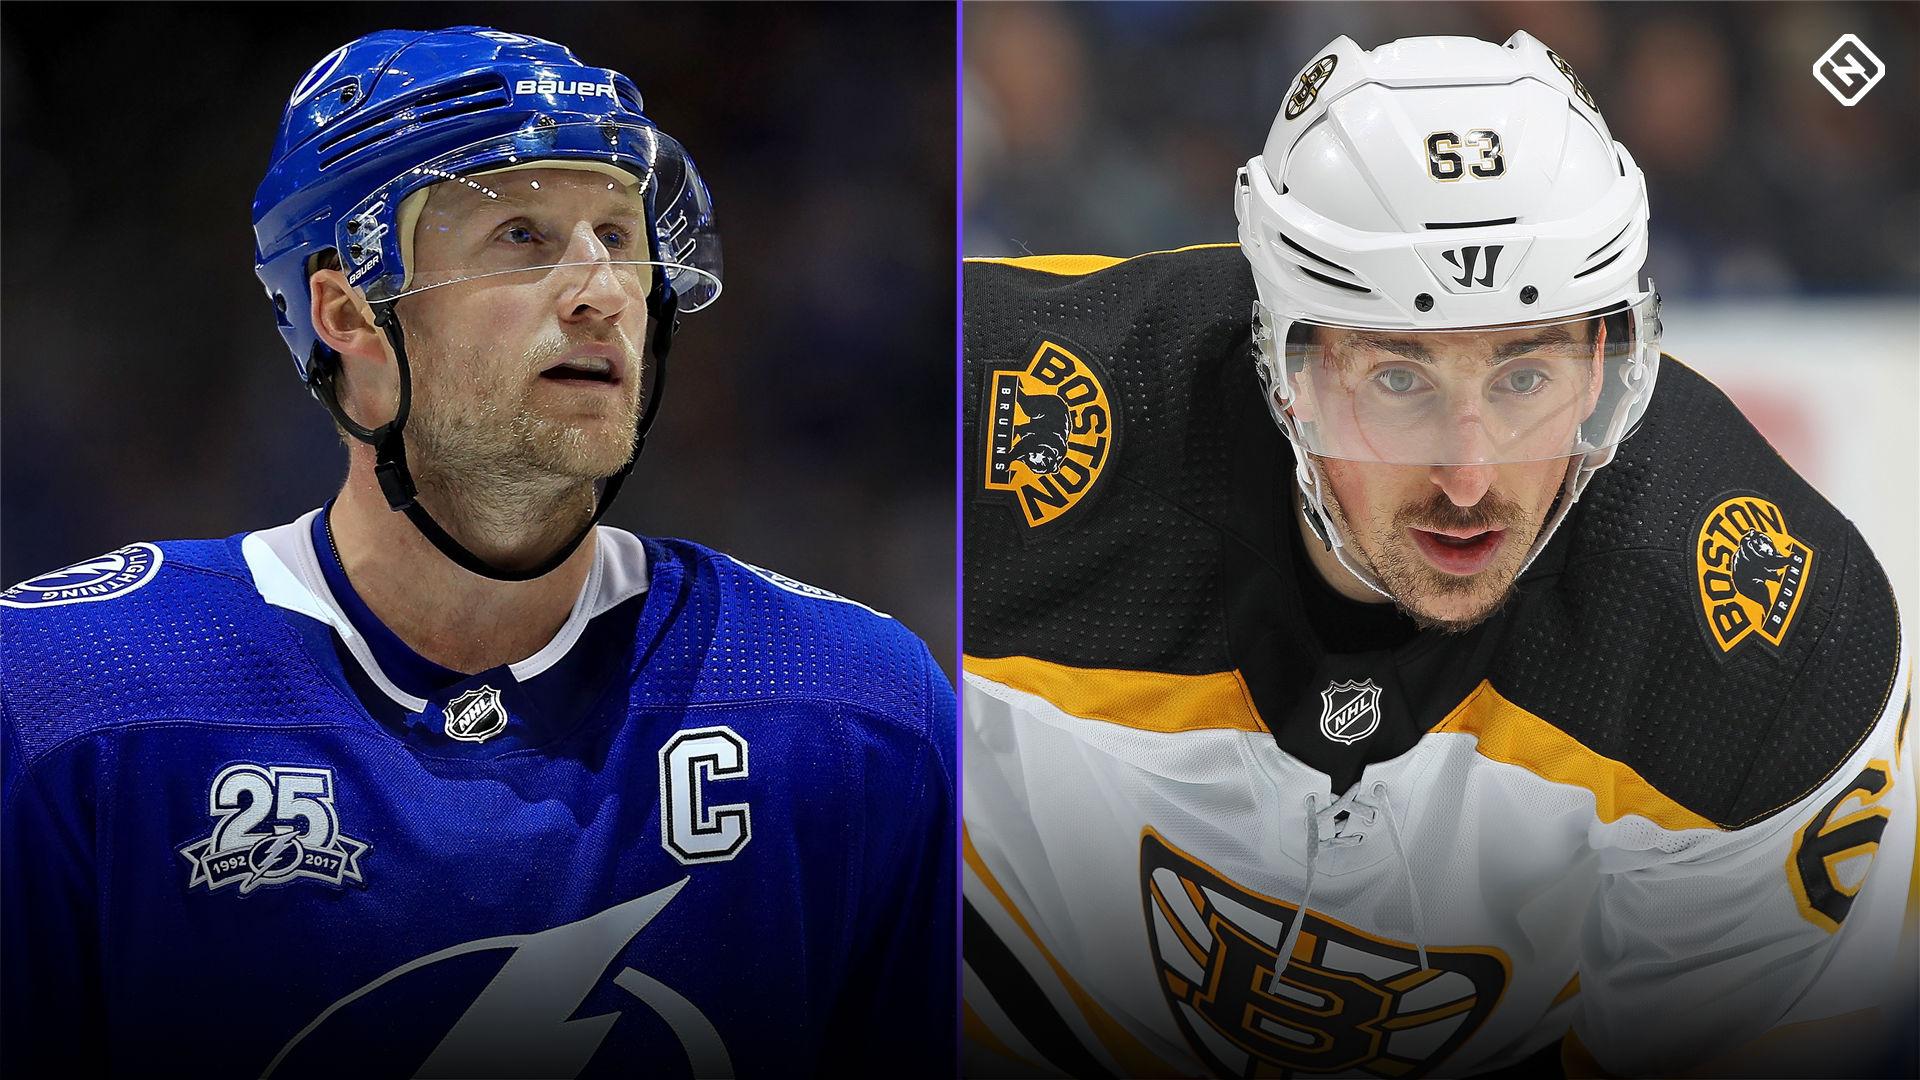 Lightning vs Bruins